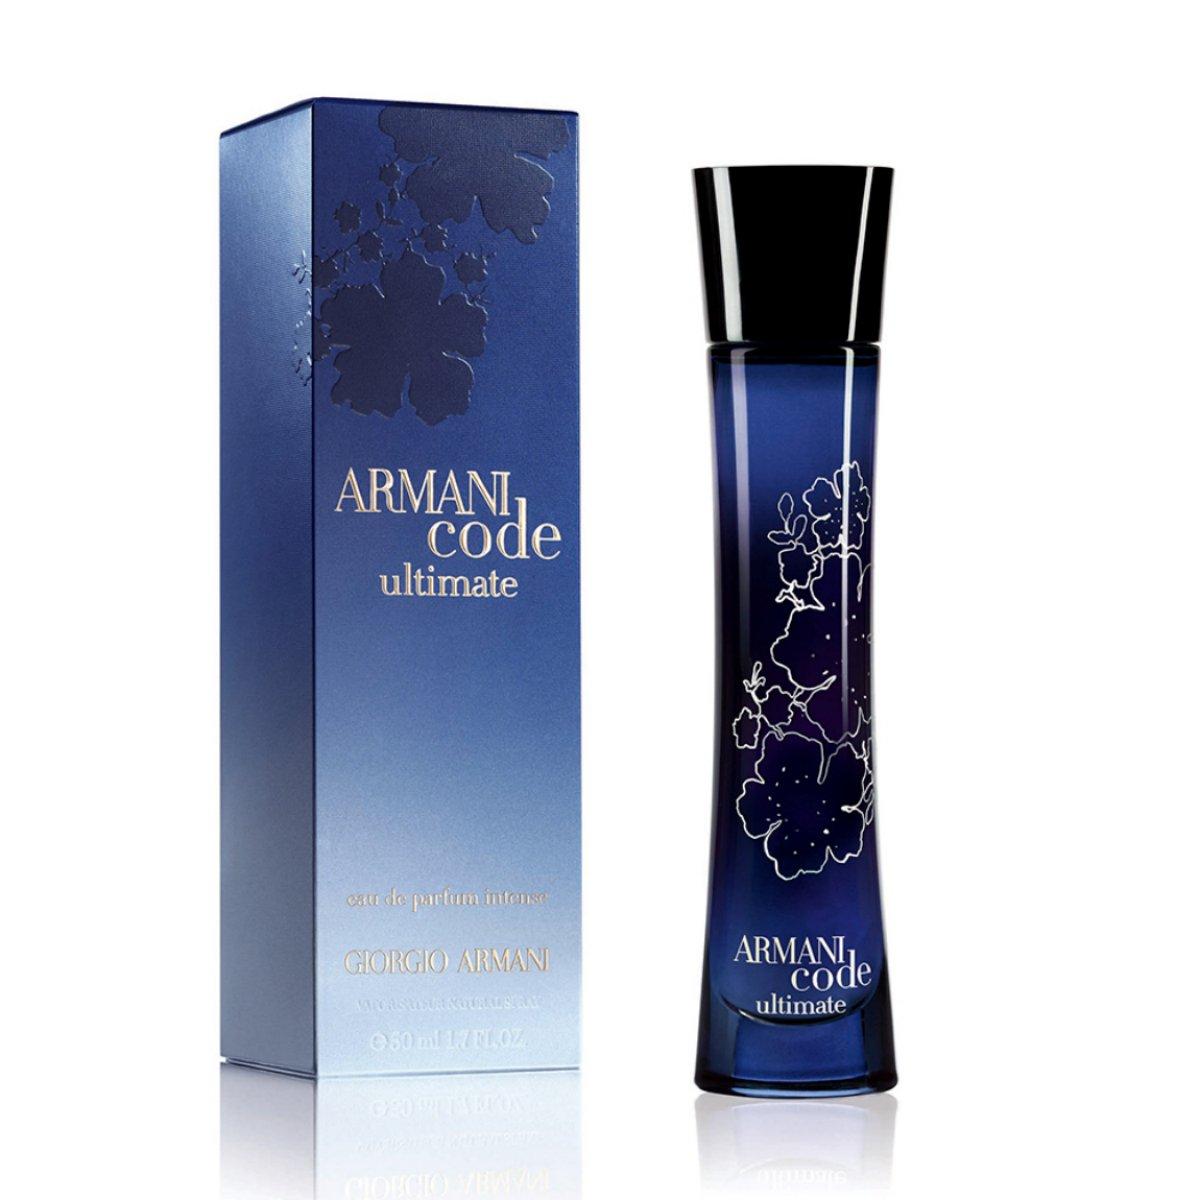 70122893feee viporte  Giorgio Armani code ultimate intense EDP Eau de Parfum SP 50 ml GIORGIO  ARMANI CODE ULTIMATE INTENSE POUR FEMME EAU DE PARFUM SPRAY